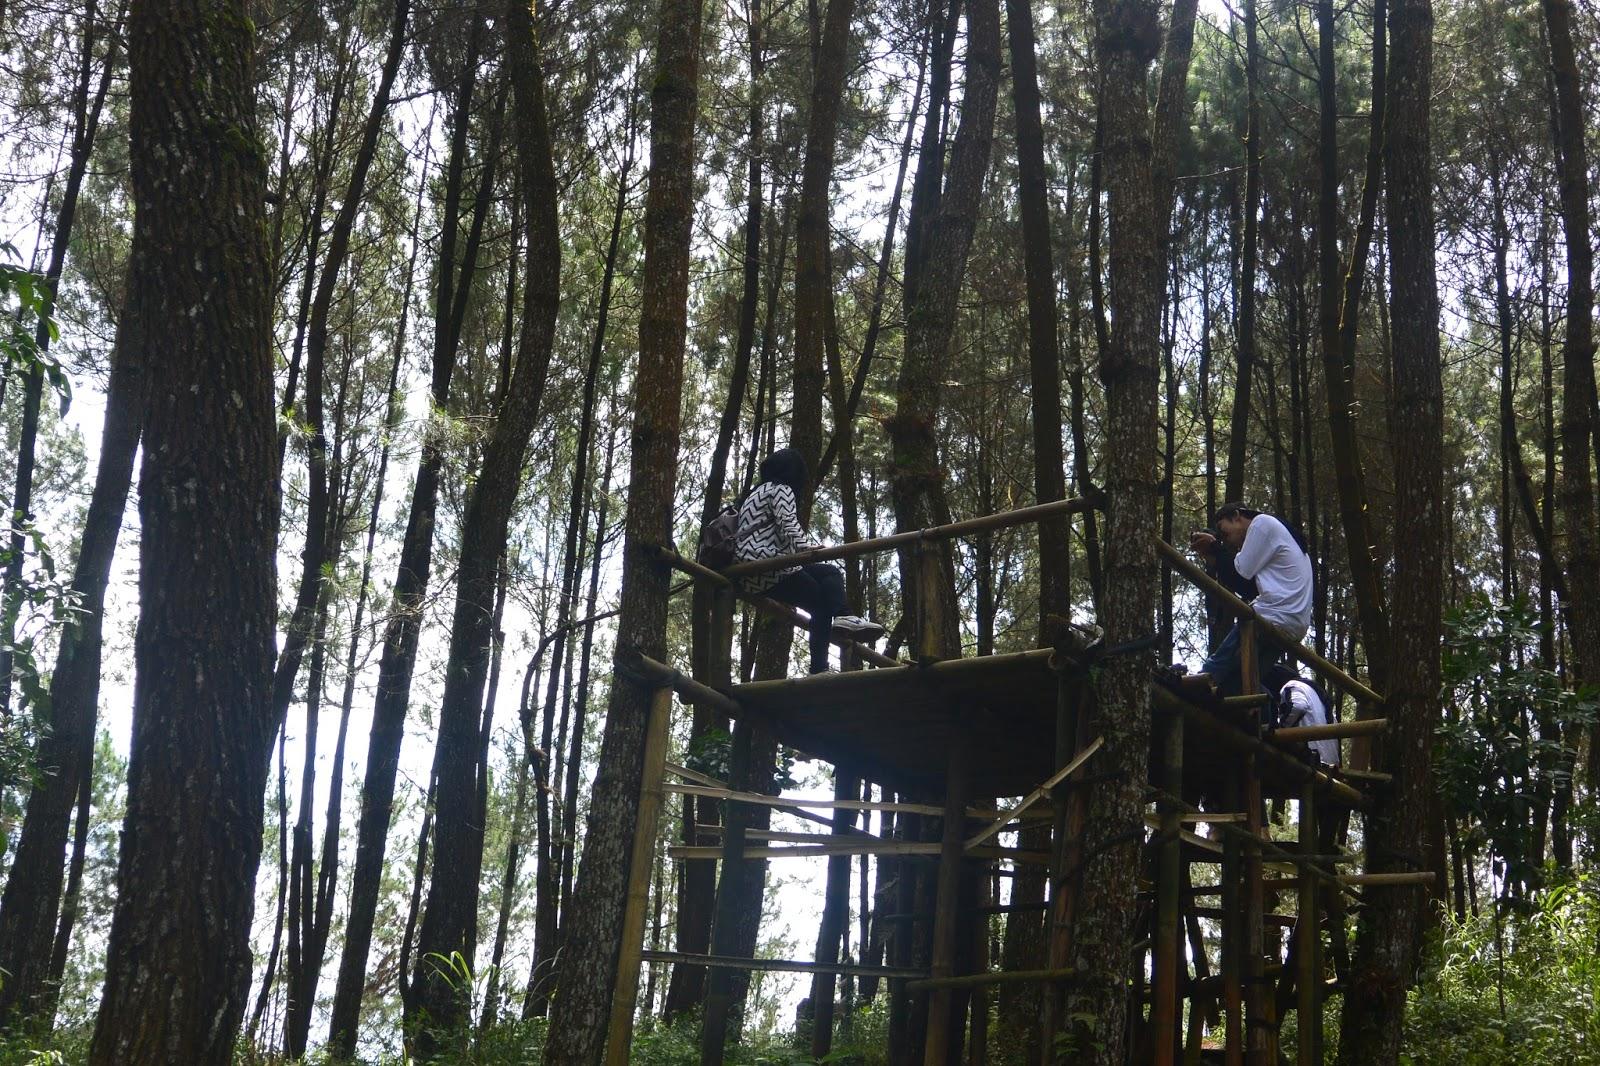 Top Selfie Pinusan Kragilan Hutan Pinus Magelang Makin Dikenal Grenden